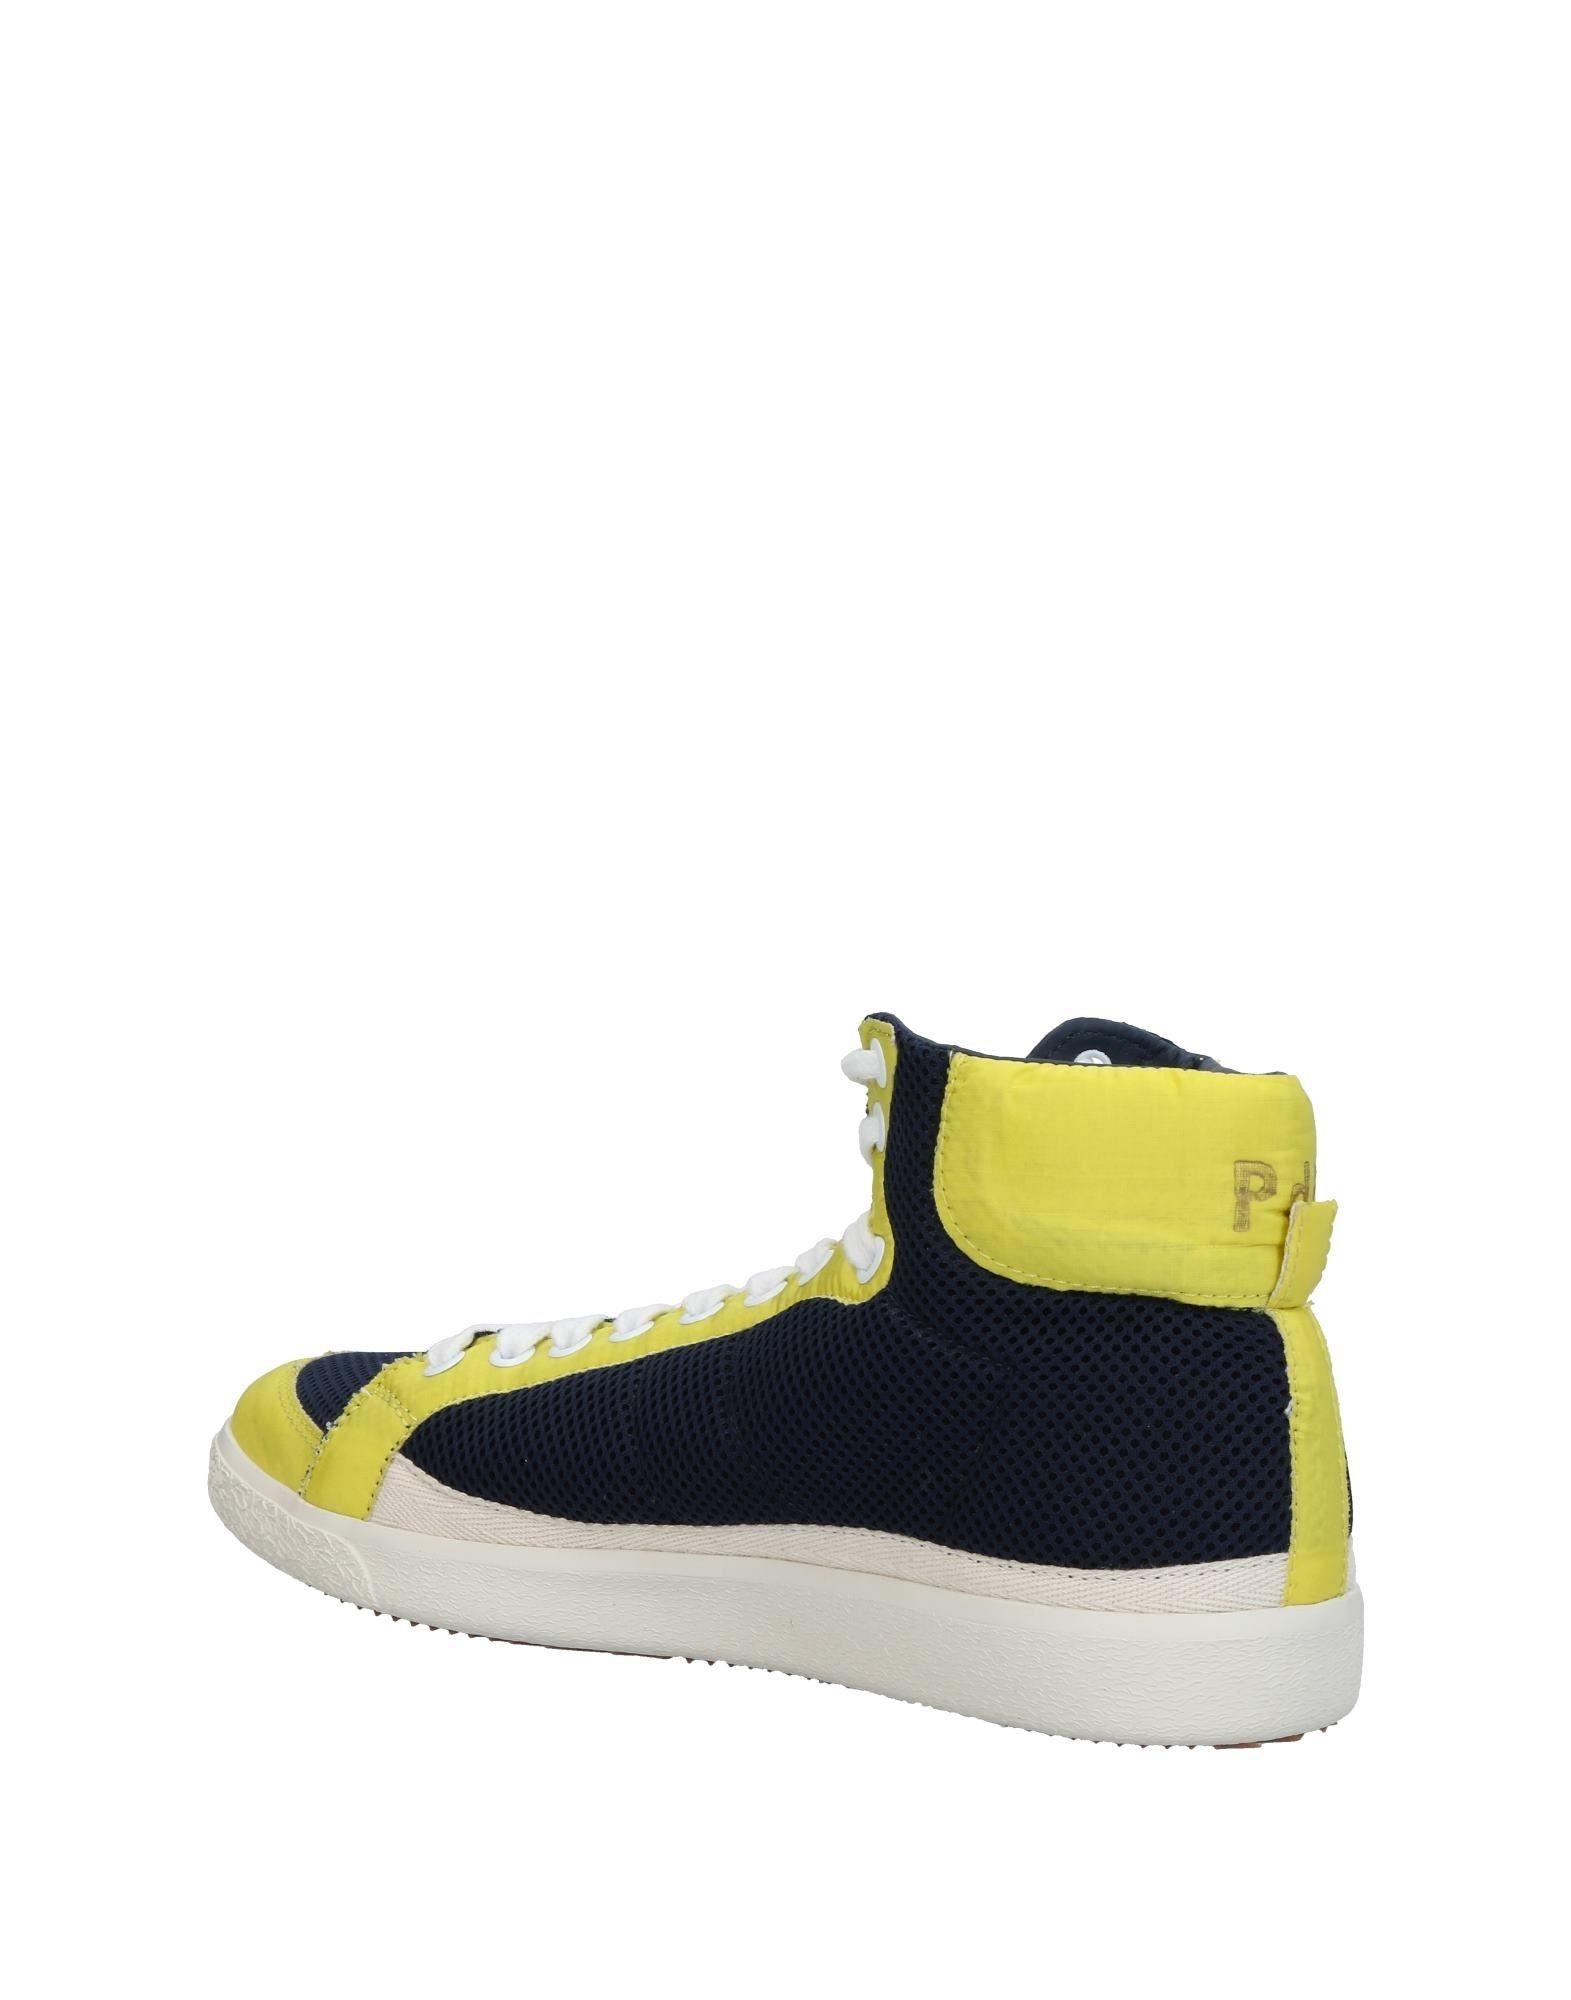 Rabatt echte Schuhe Pantofola D'oro Sneakers Herren  11456469TI